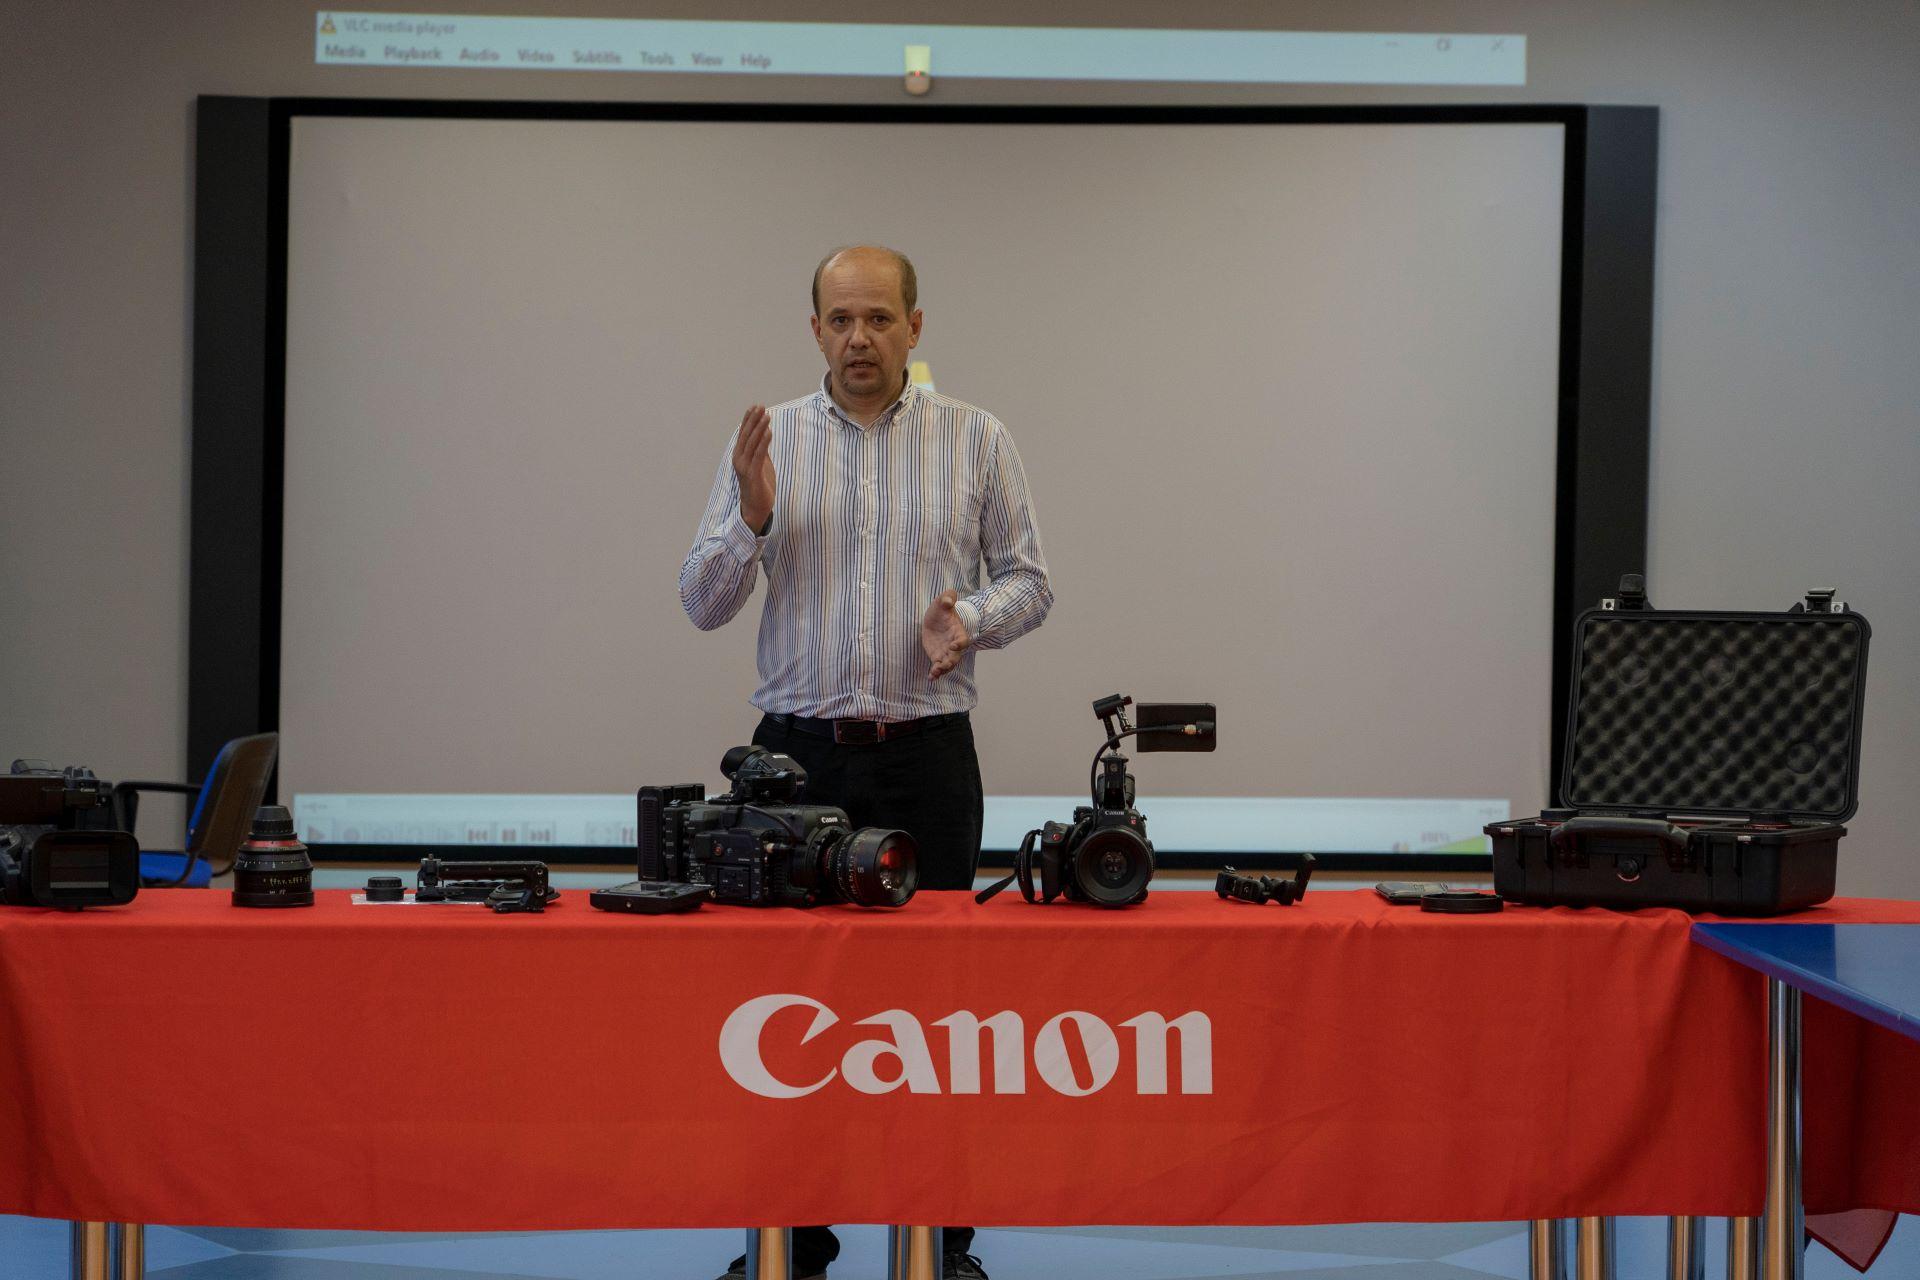 03.08.19 Семинар Съемочная техника Canon. TVS Service LTD